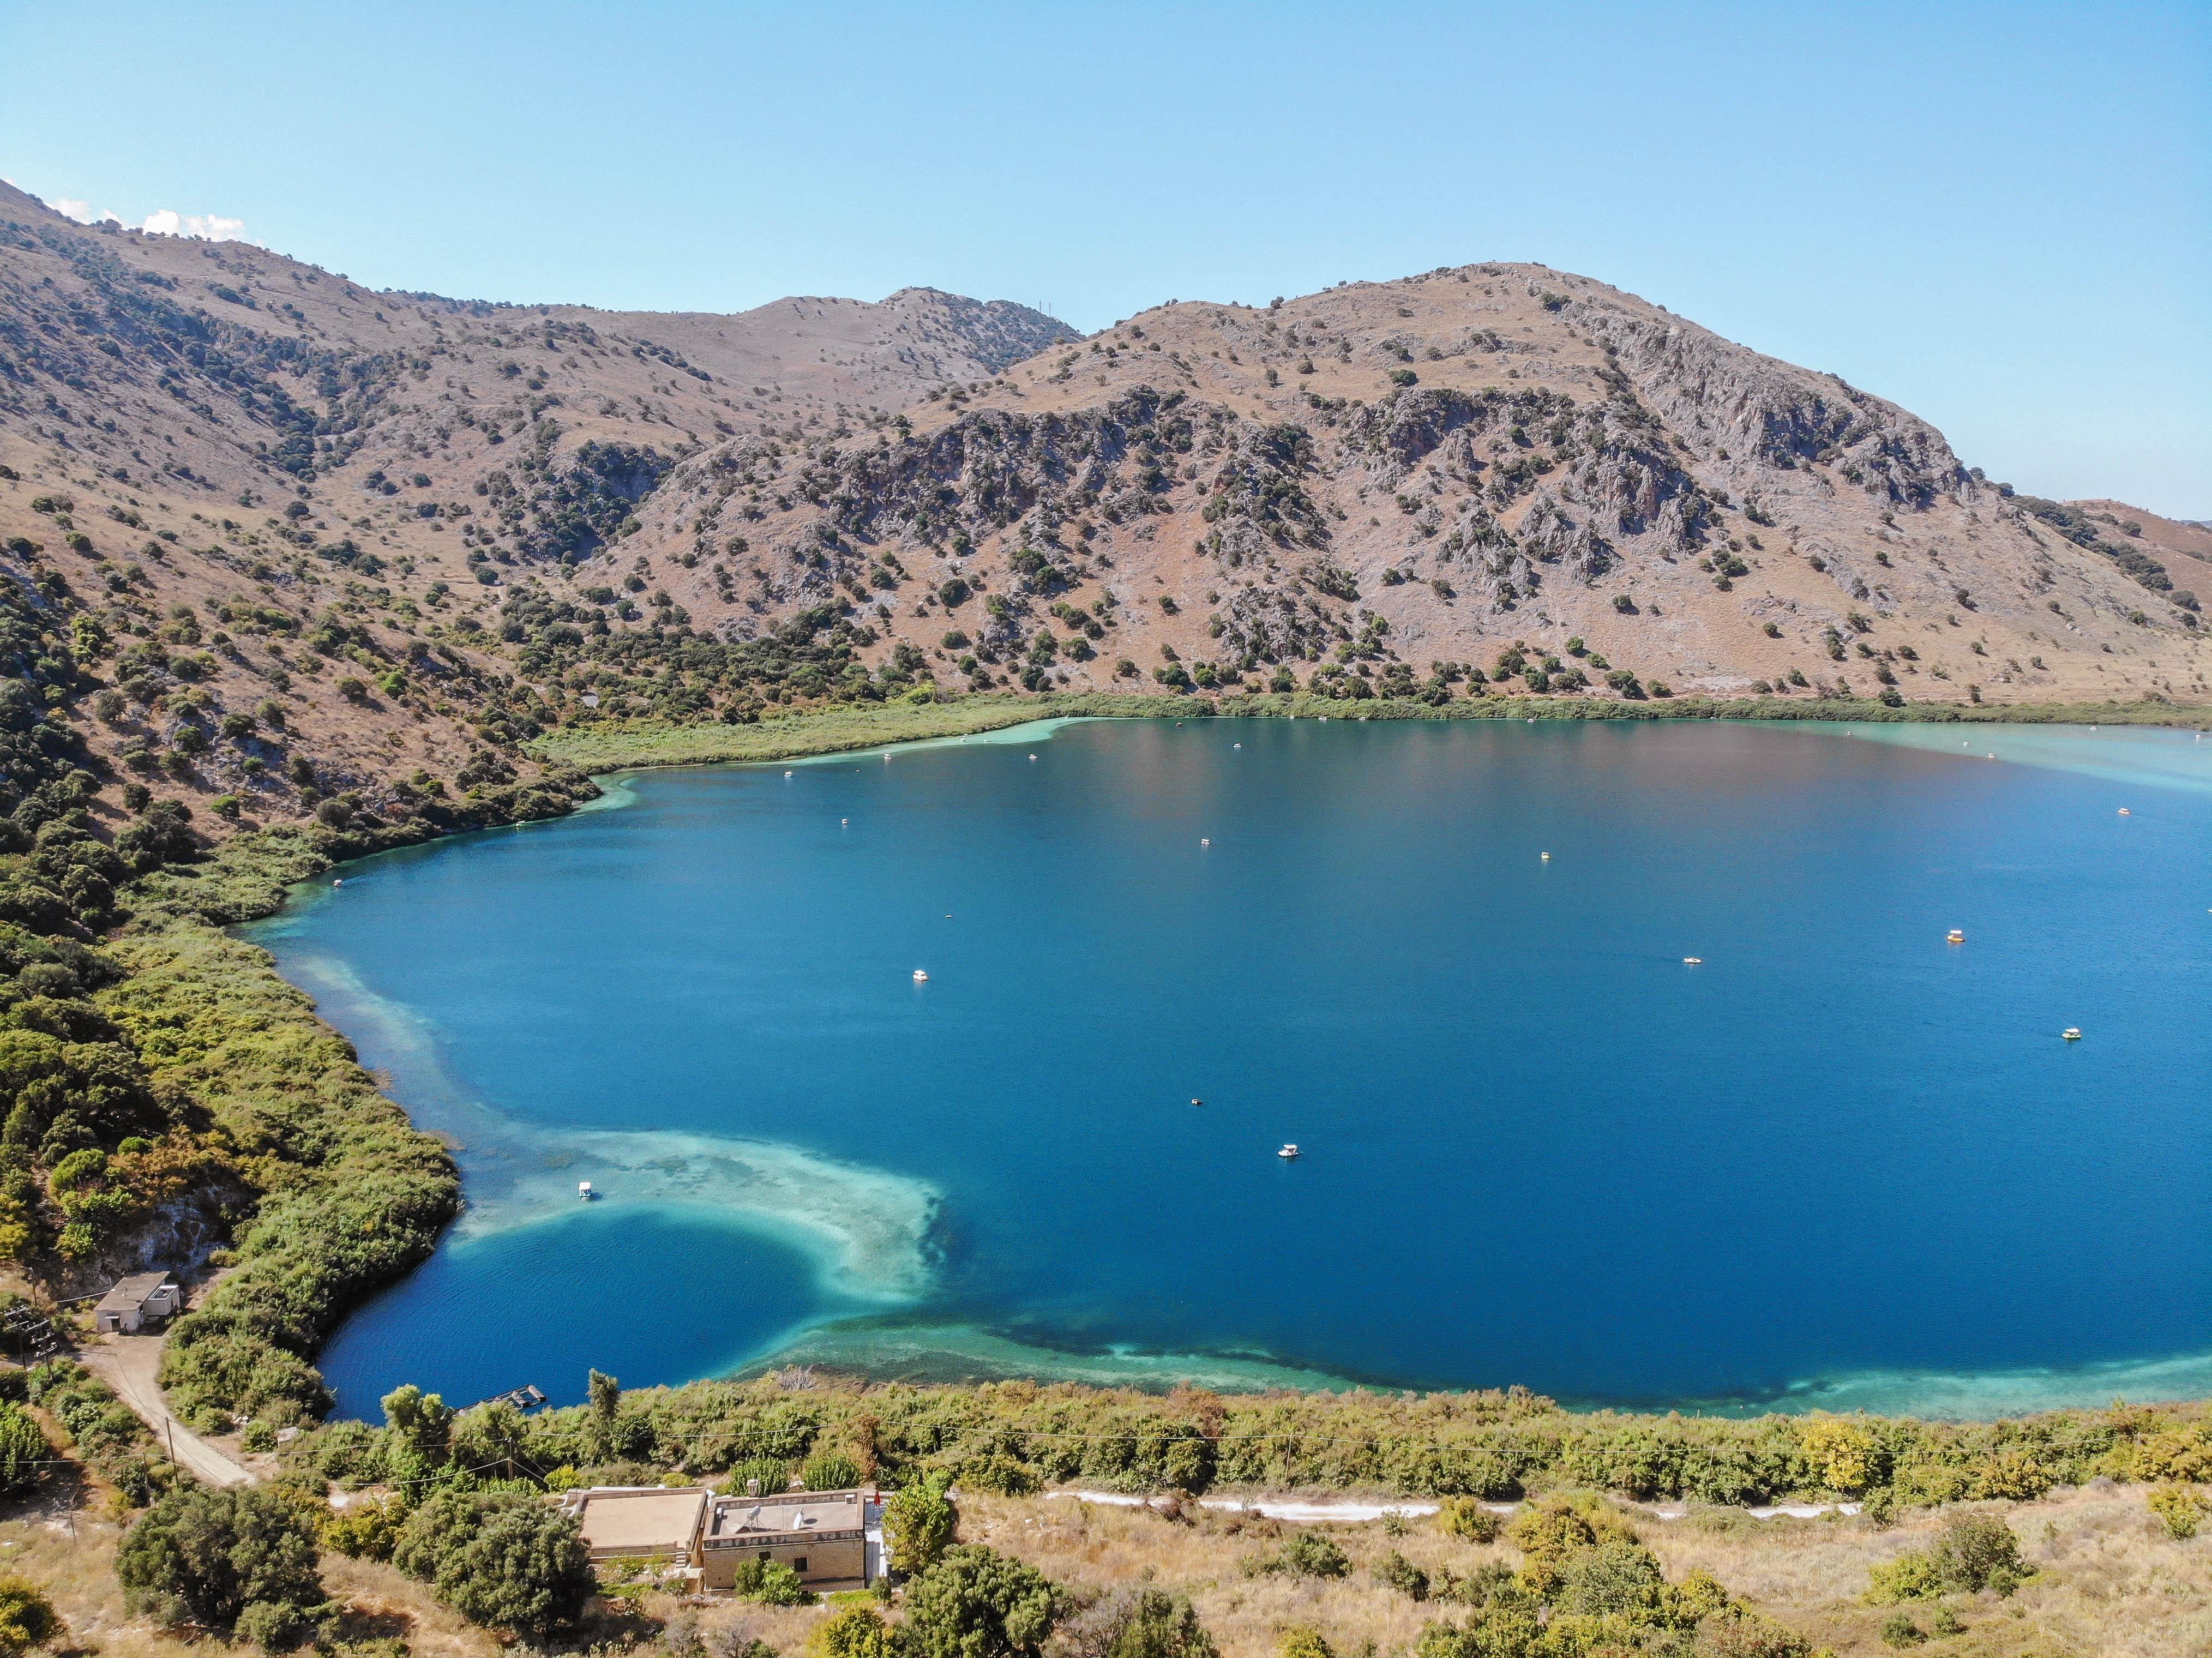 Lac-de-kournas-kournas-lake-crete